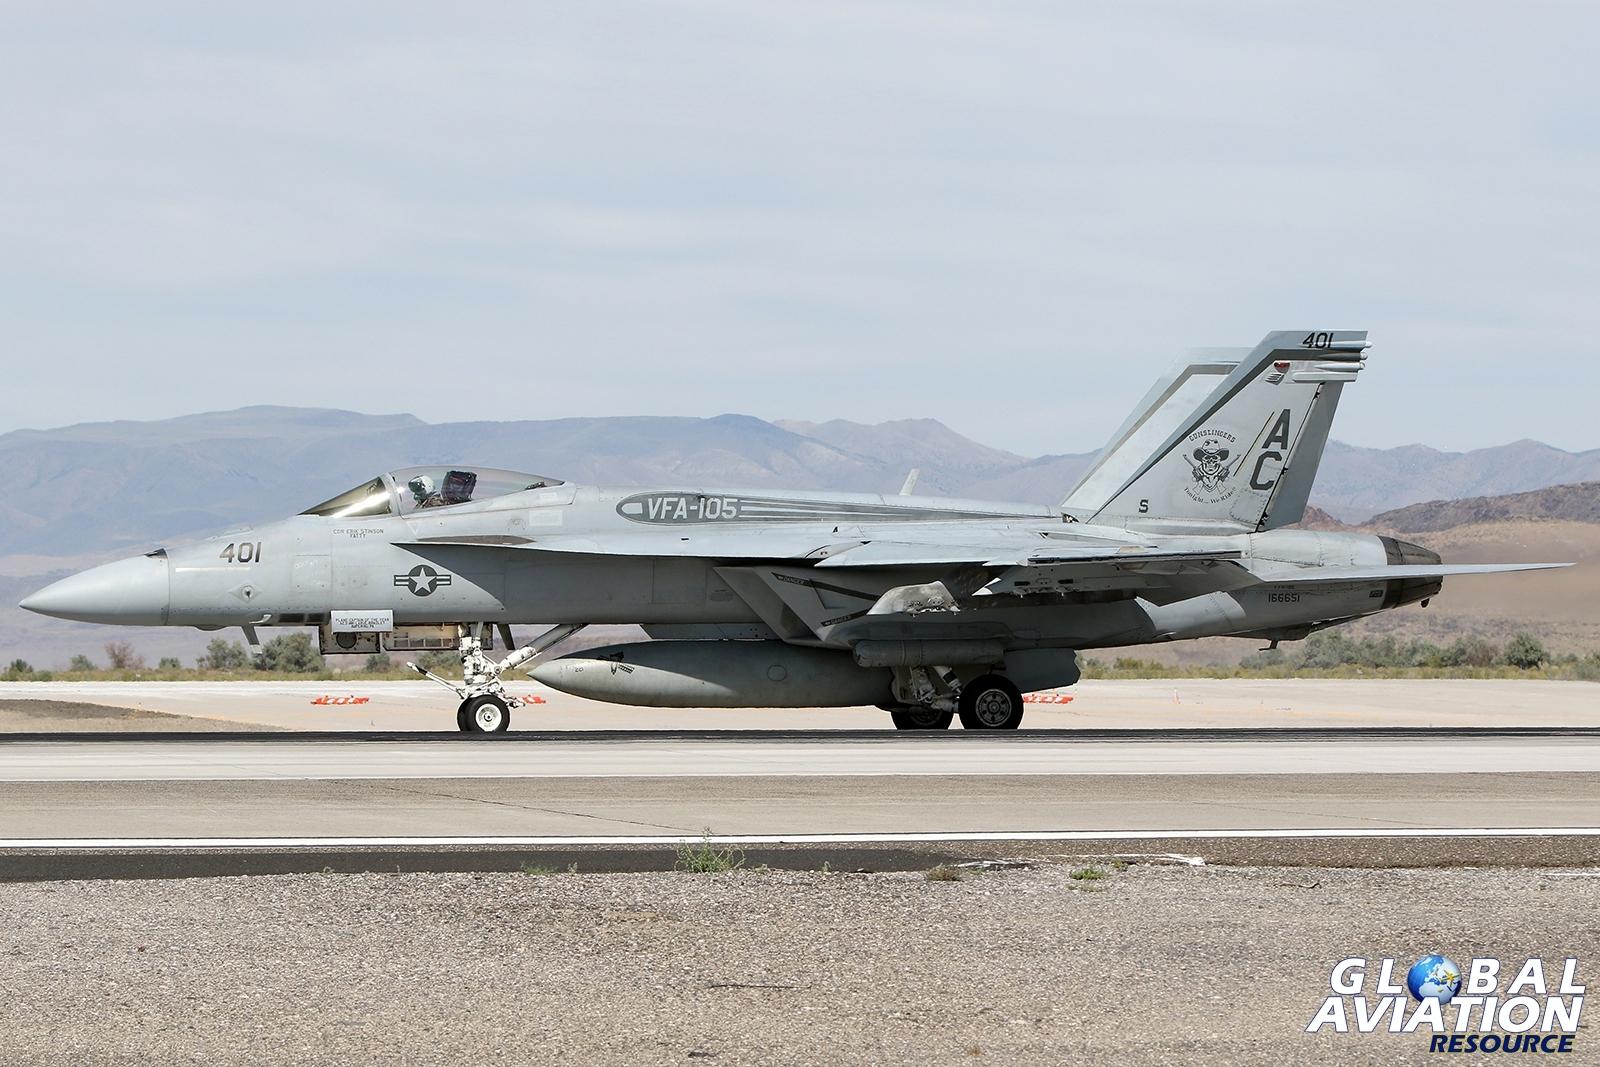 VFA-105 Gunslingers F/A-18E © Paul Dunn - Global Aviation Resource